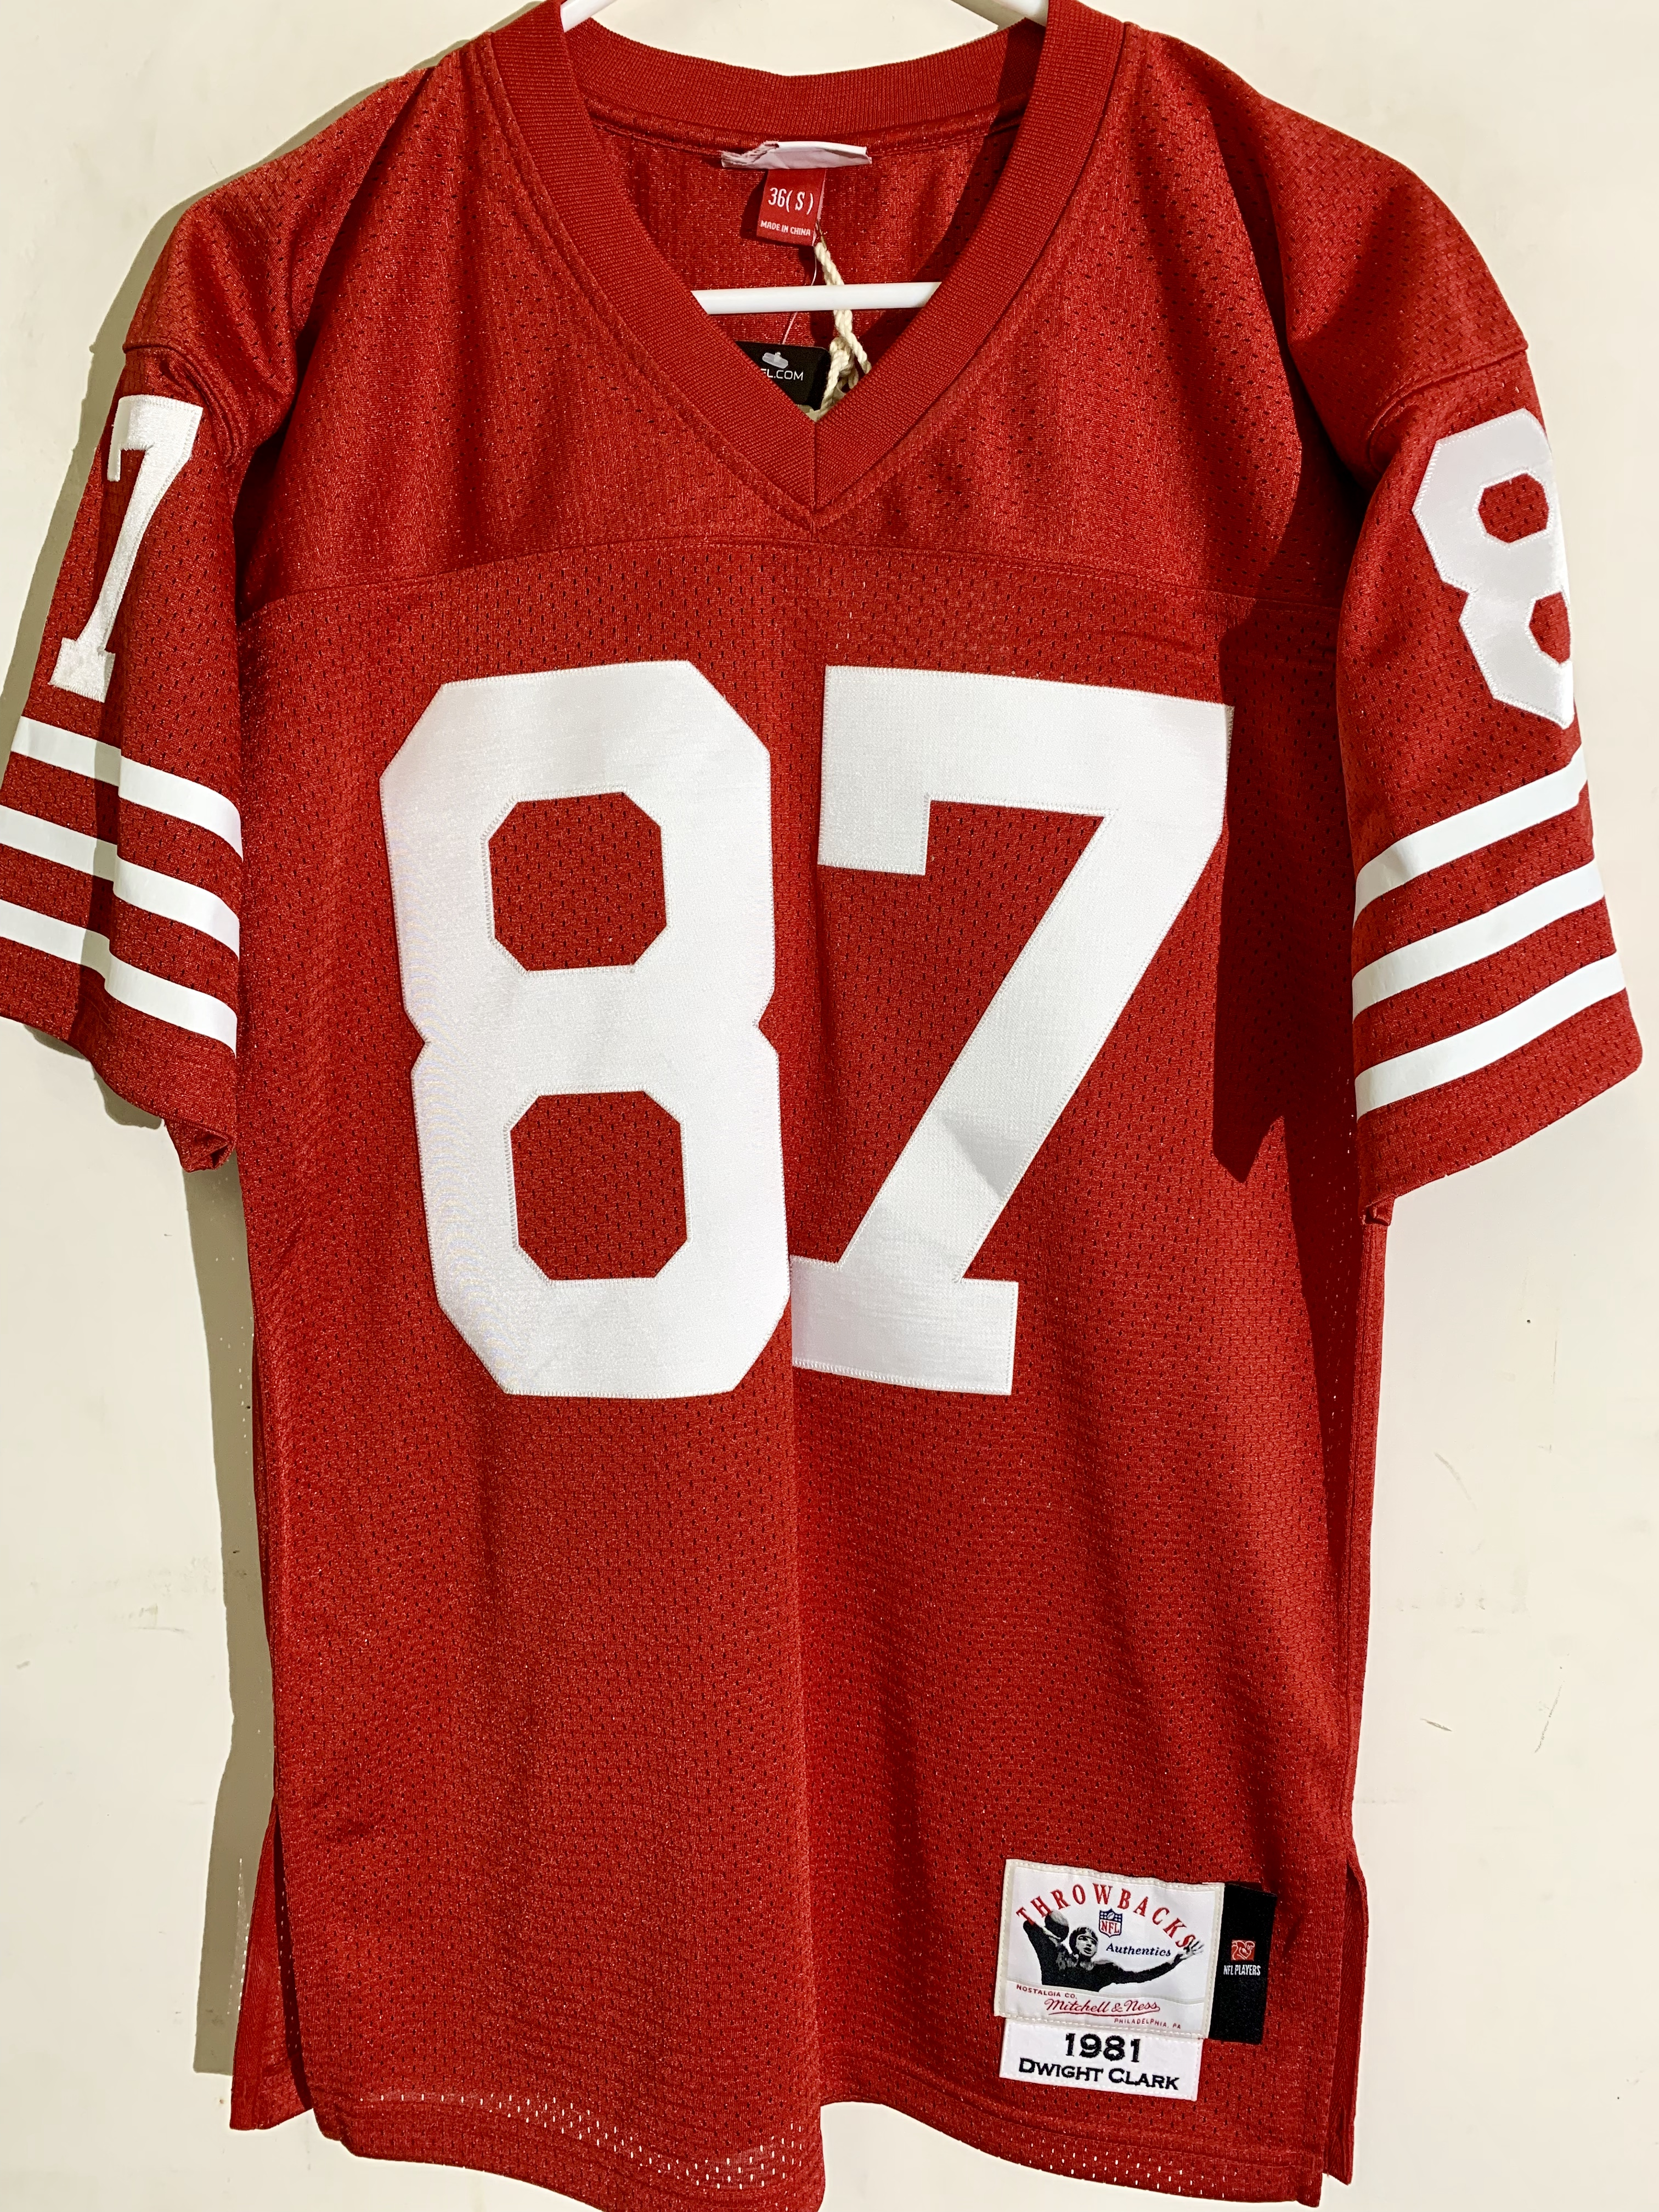 a3c6b5c9b Reebok Authentic NFL Jersey San Francisco 49ers Clark Red sz 36